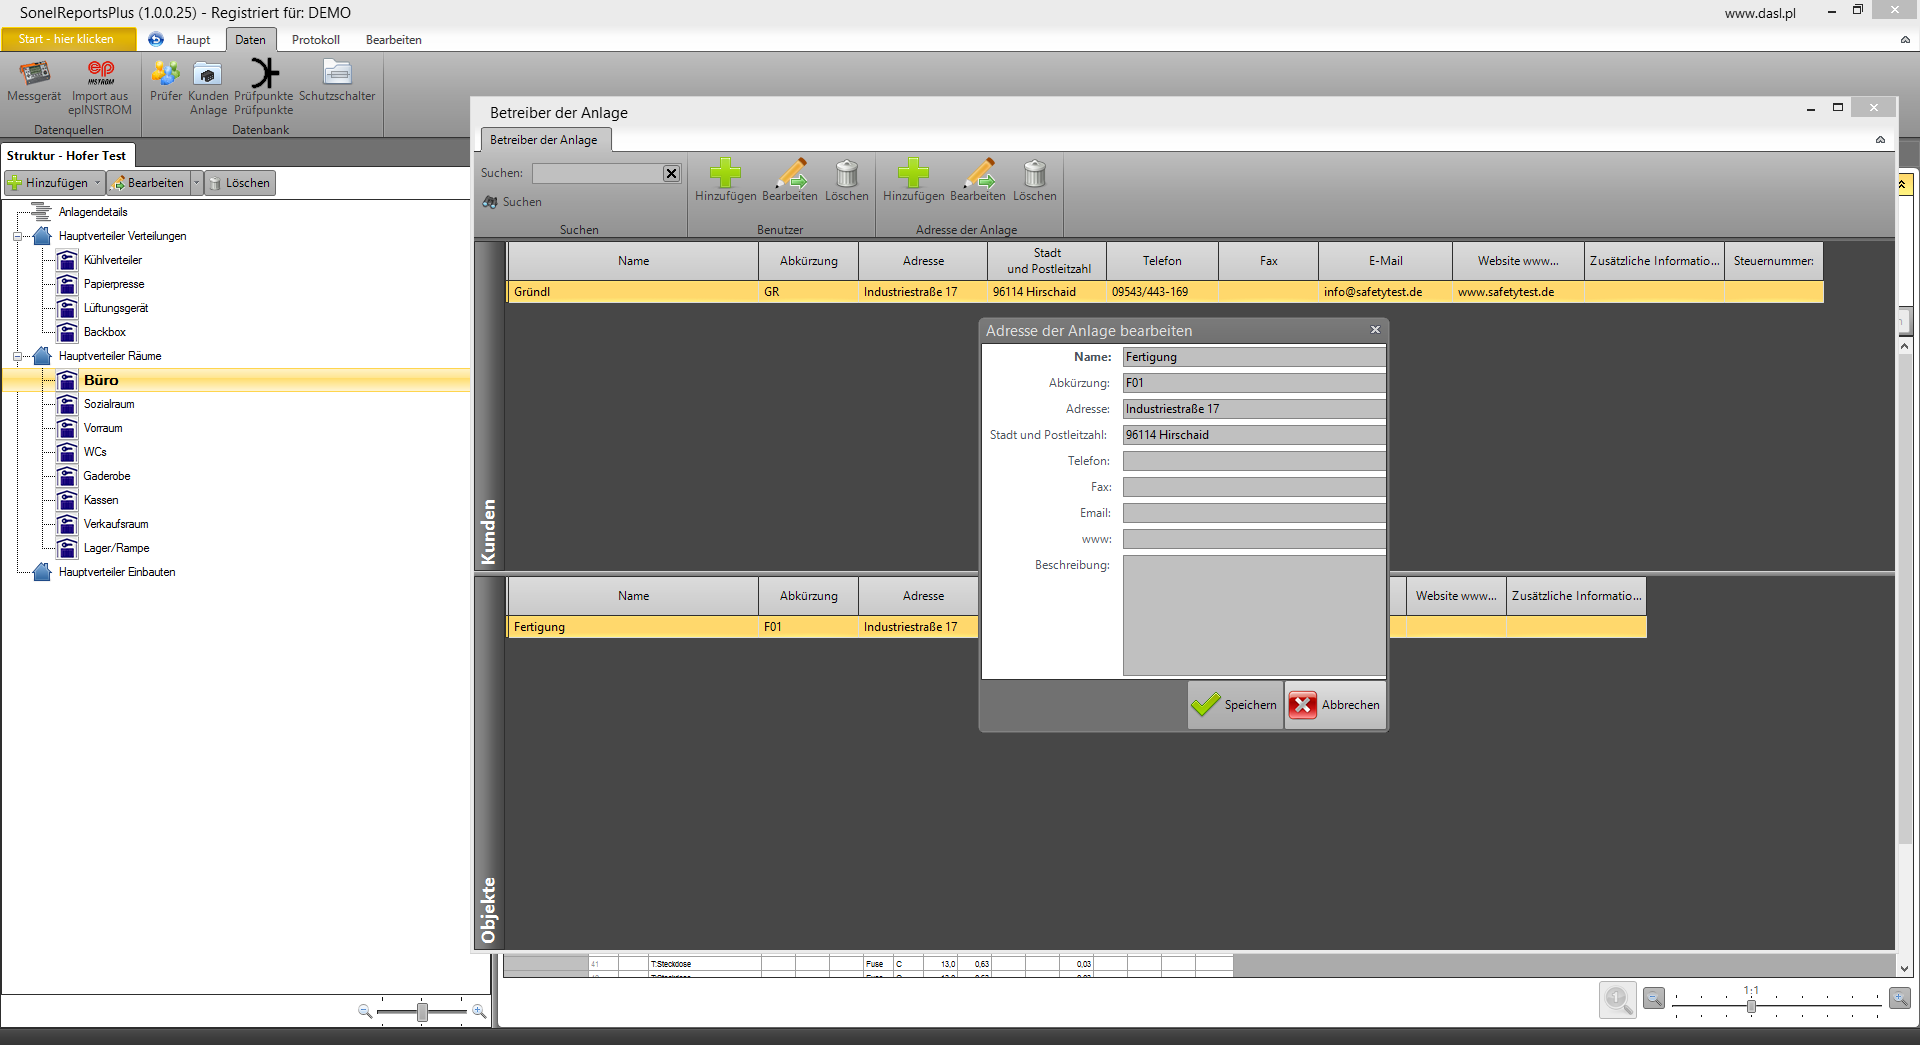 Beste Kostenlose Schaltplan Software Bilder - Verdrahtungsideen ...